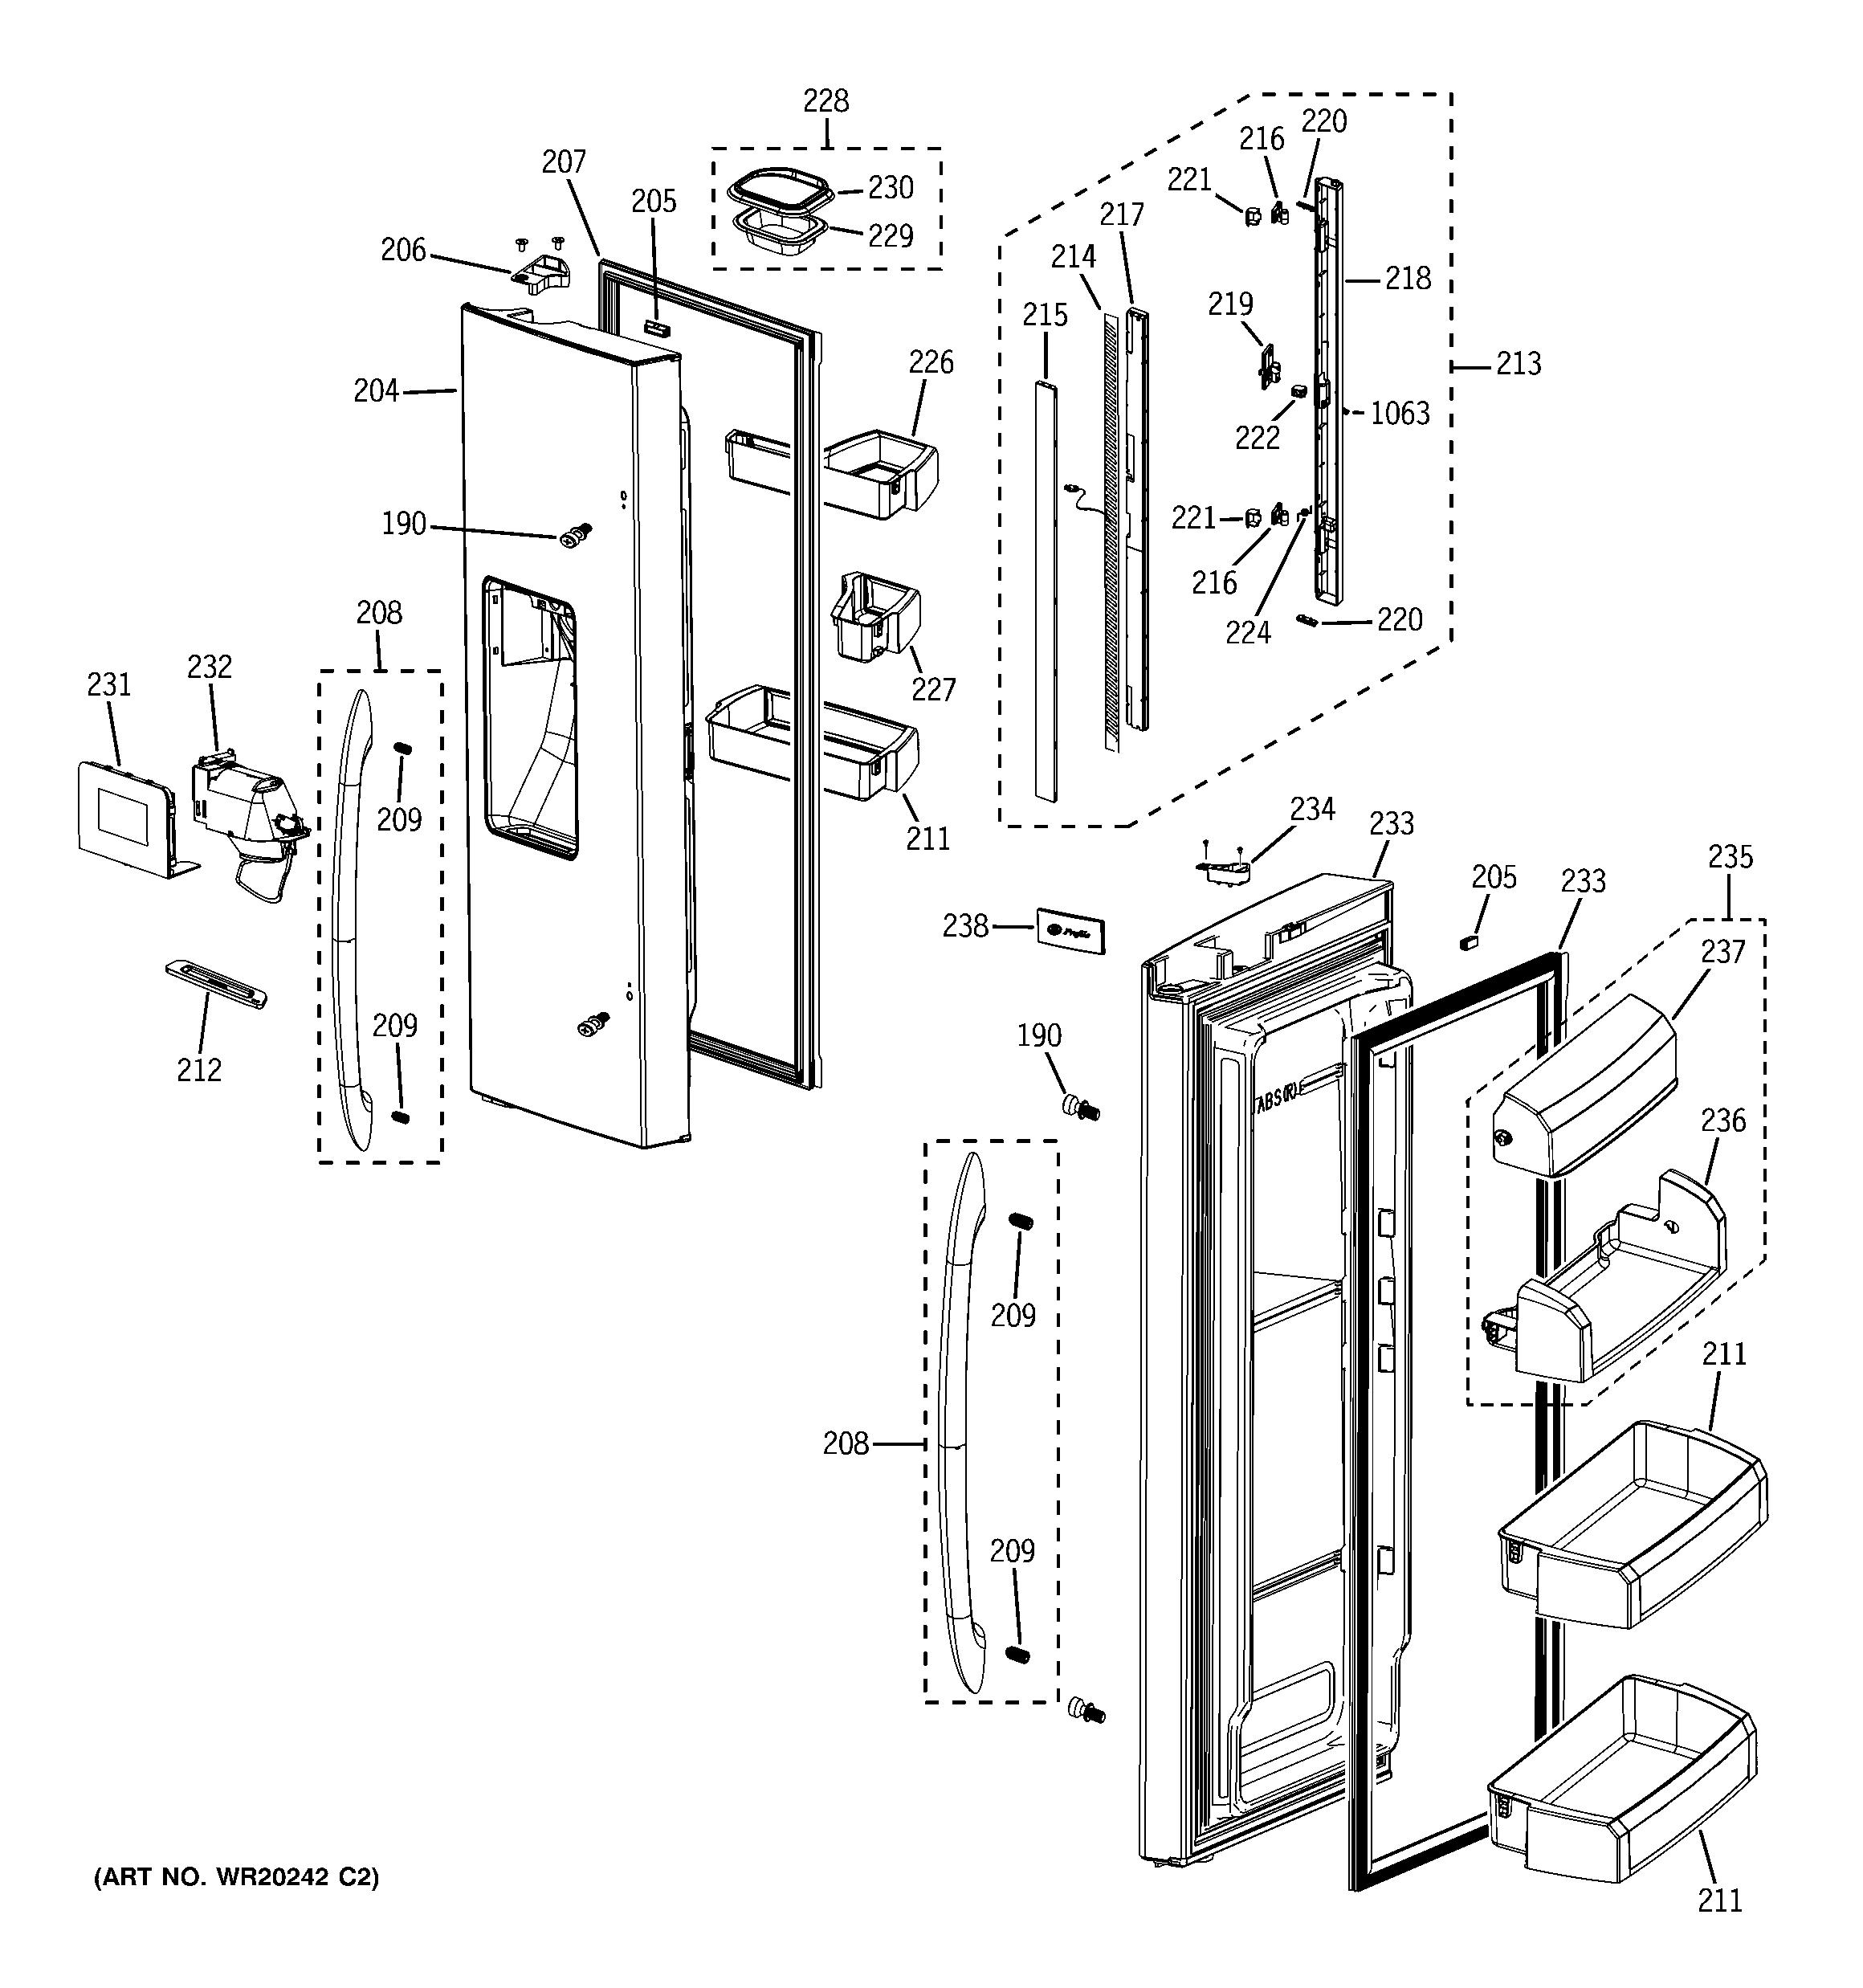 FRESH FOOD DOORS Diagram & Parts List for Model pfss6pkxdss ... on